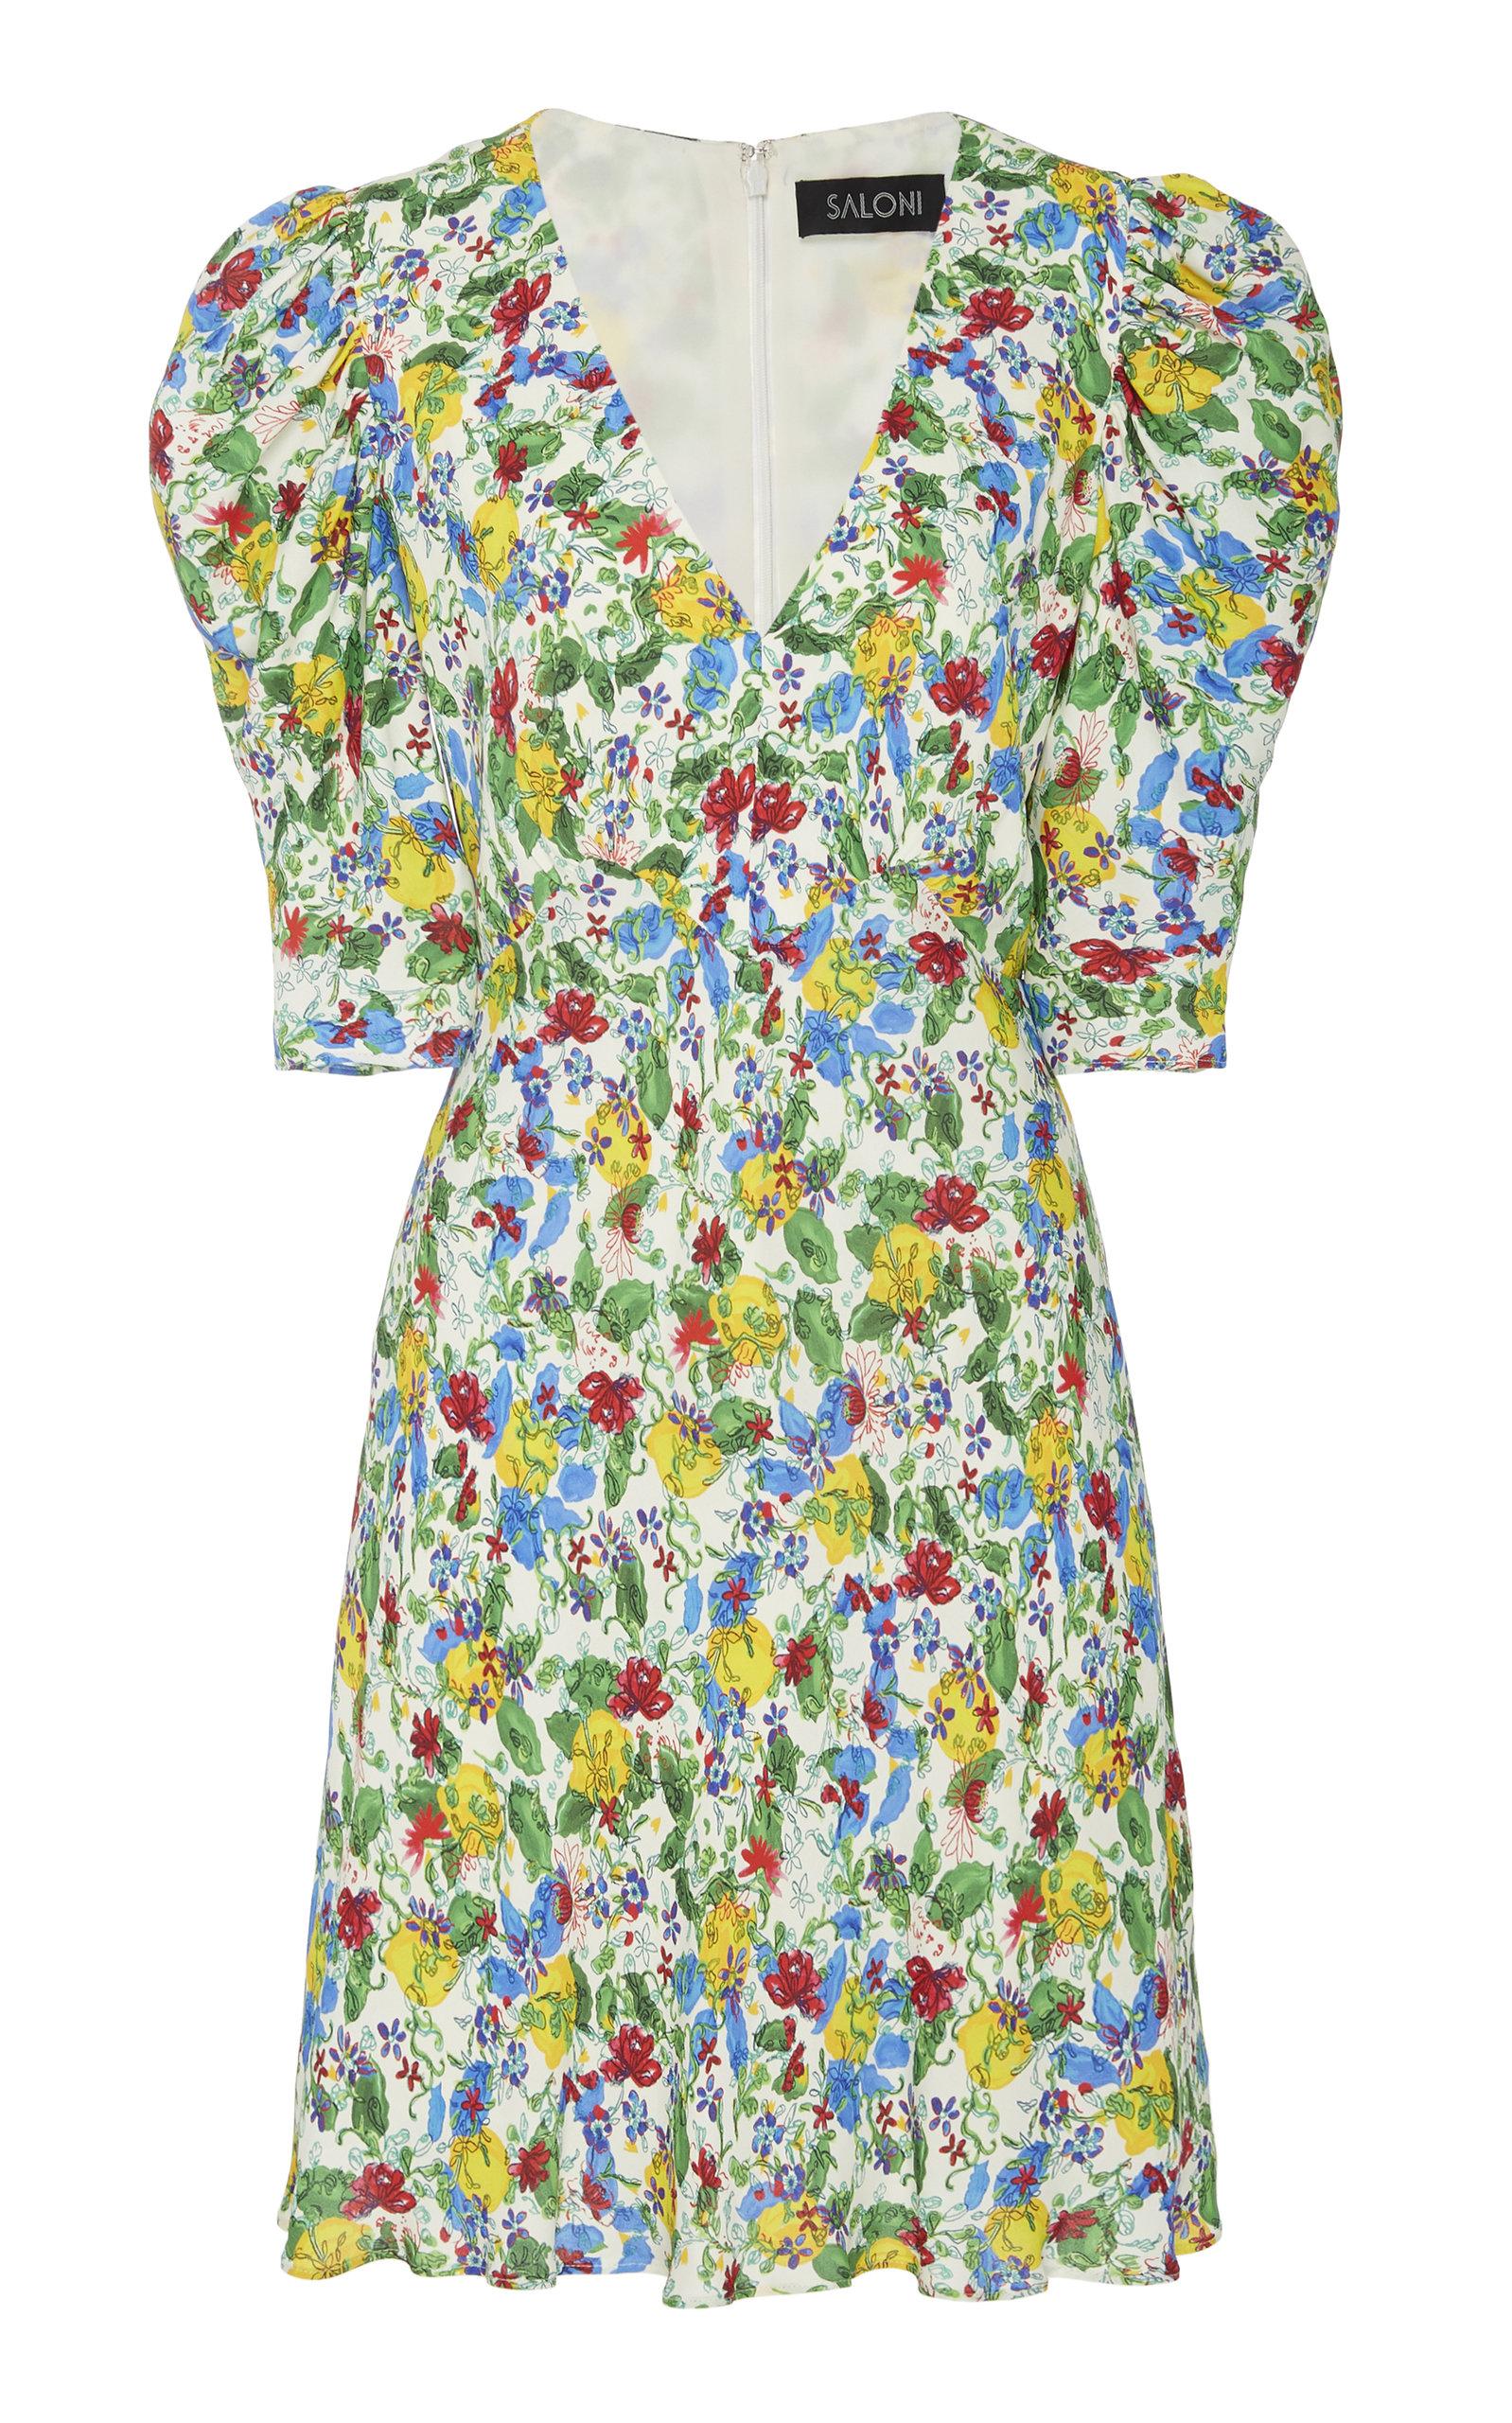 0e585a58b30d Colette Floral-Print Crepe Mini Dress by Saloni   Moda Operandi